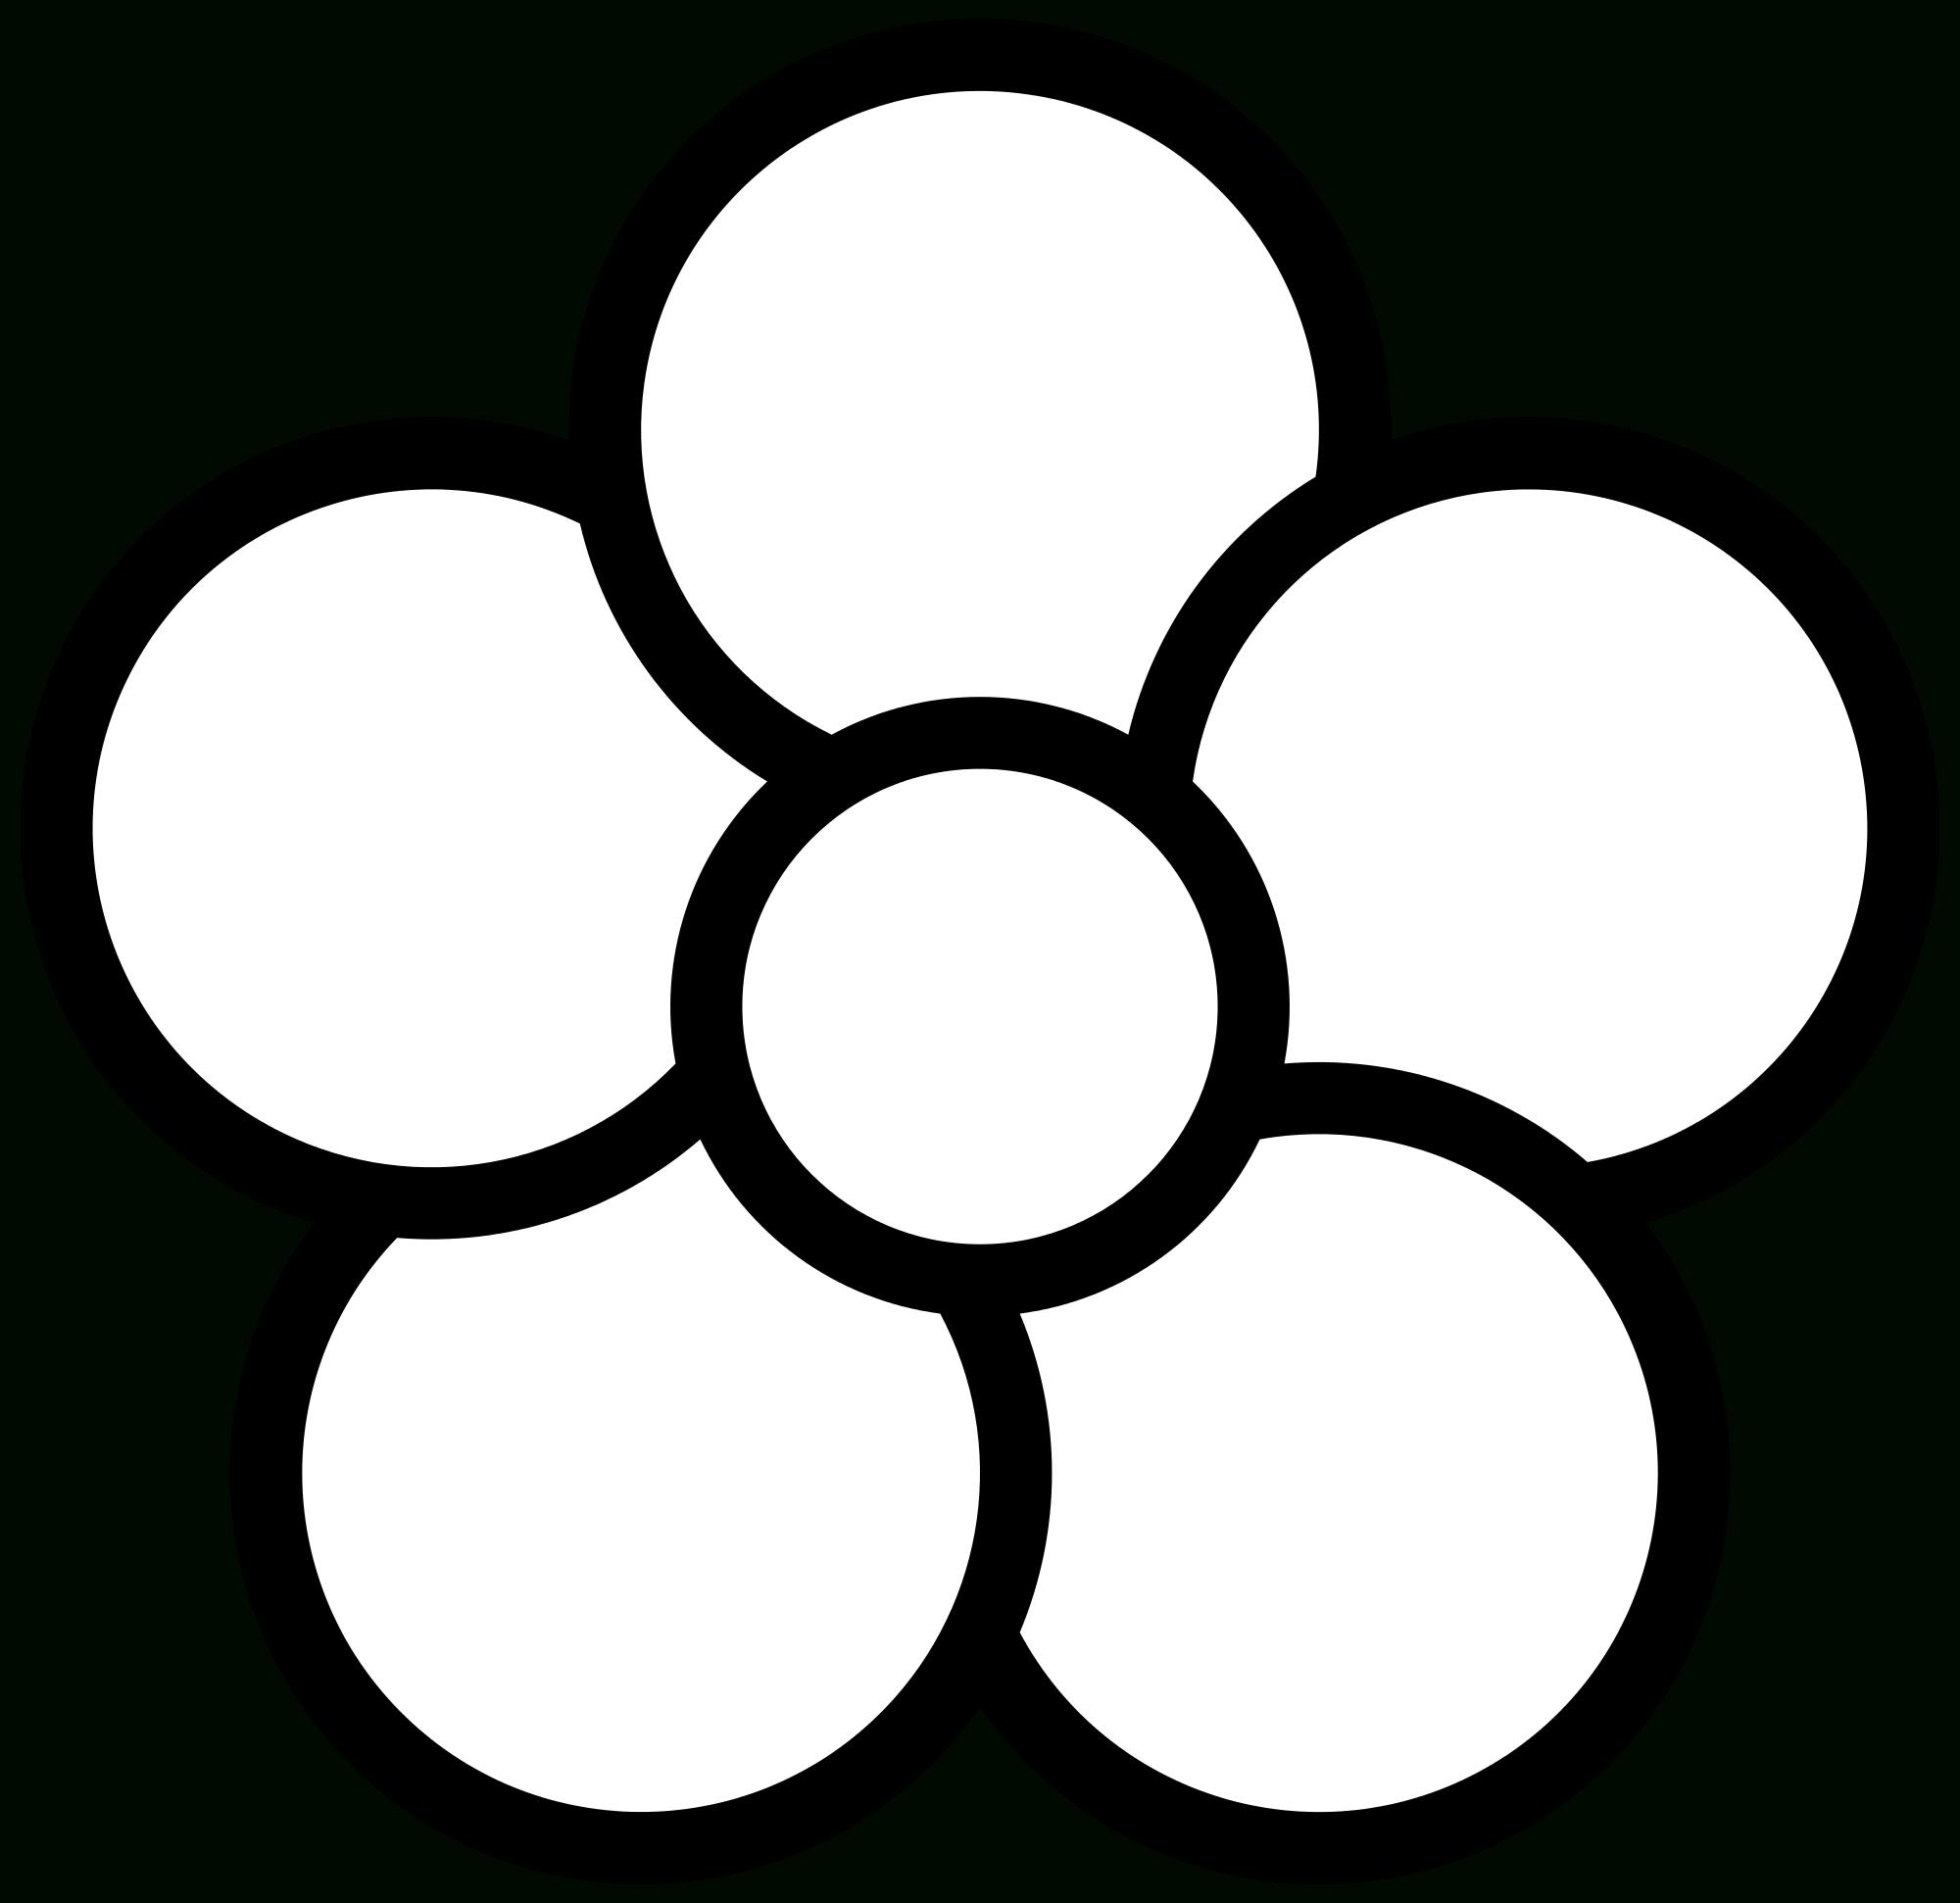 Lacalabaza filefivepetal iconwhitesvg wikimedia. Five petal flower clipart